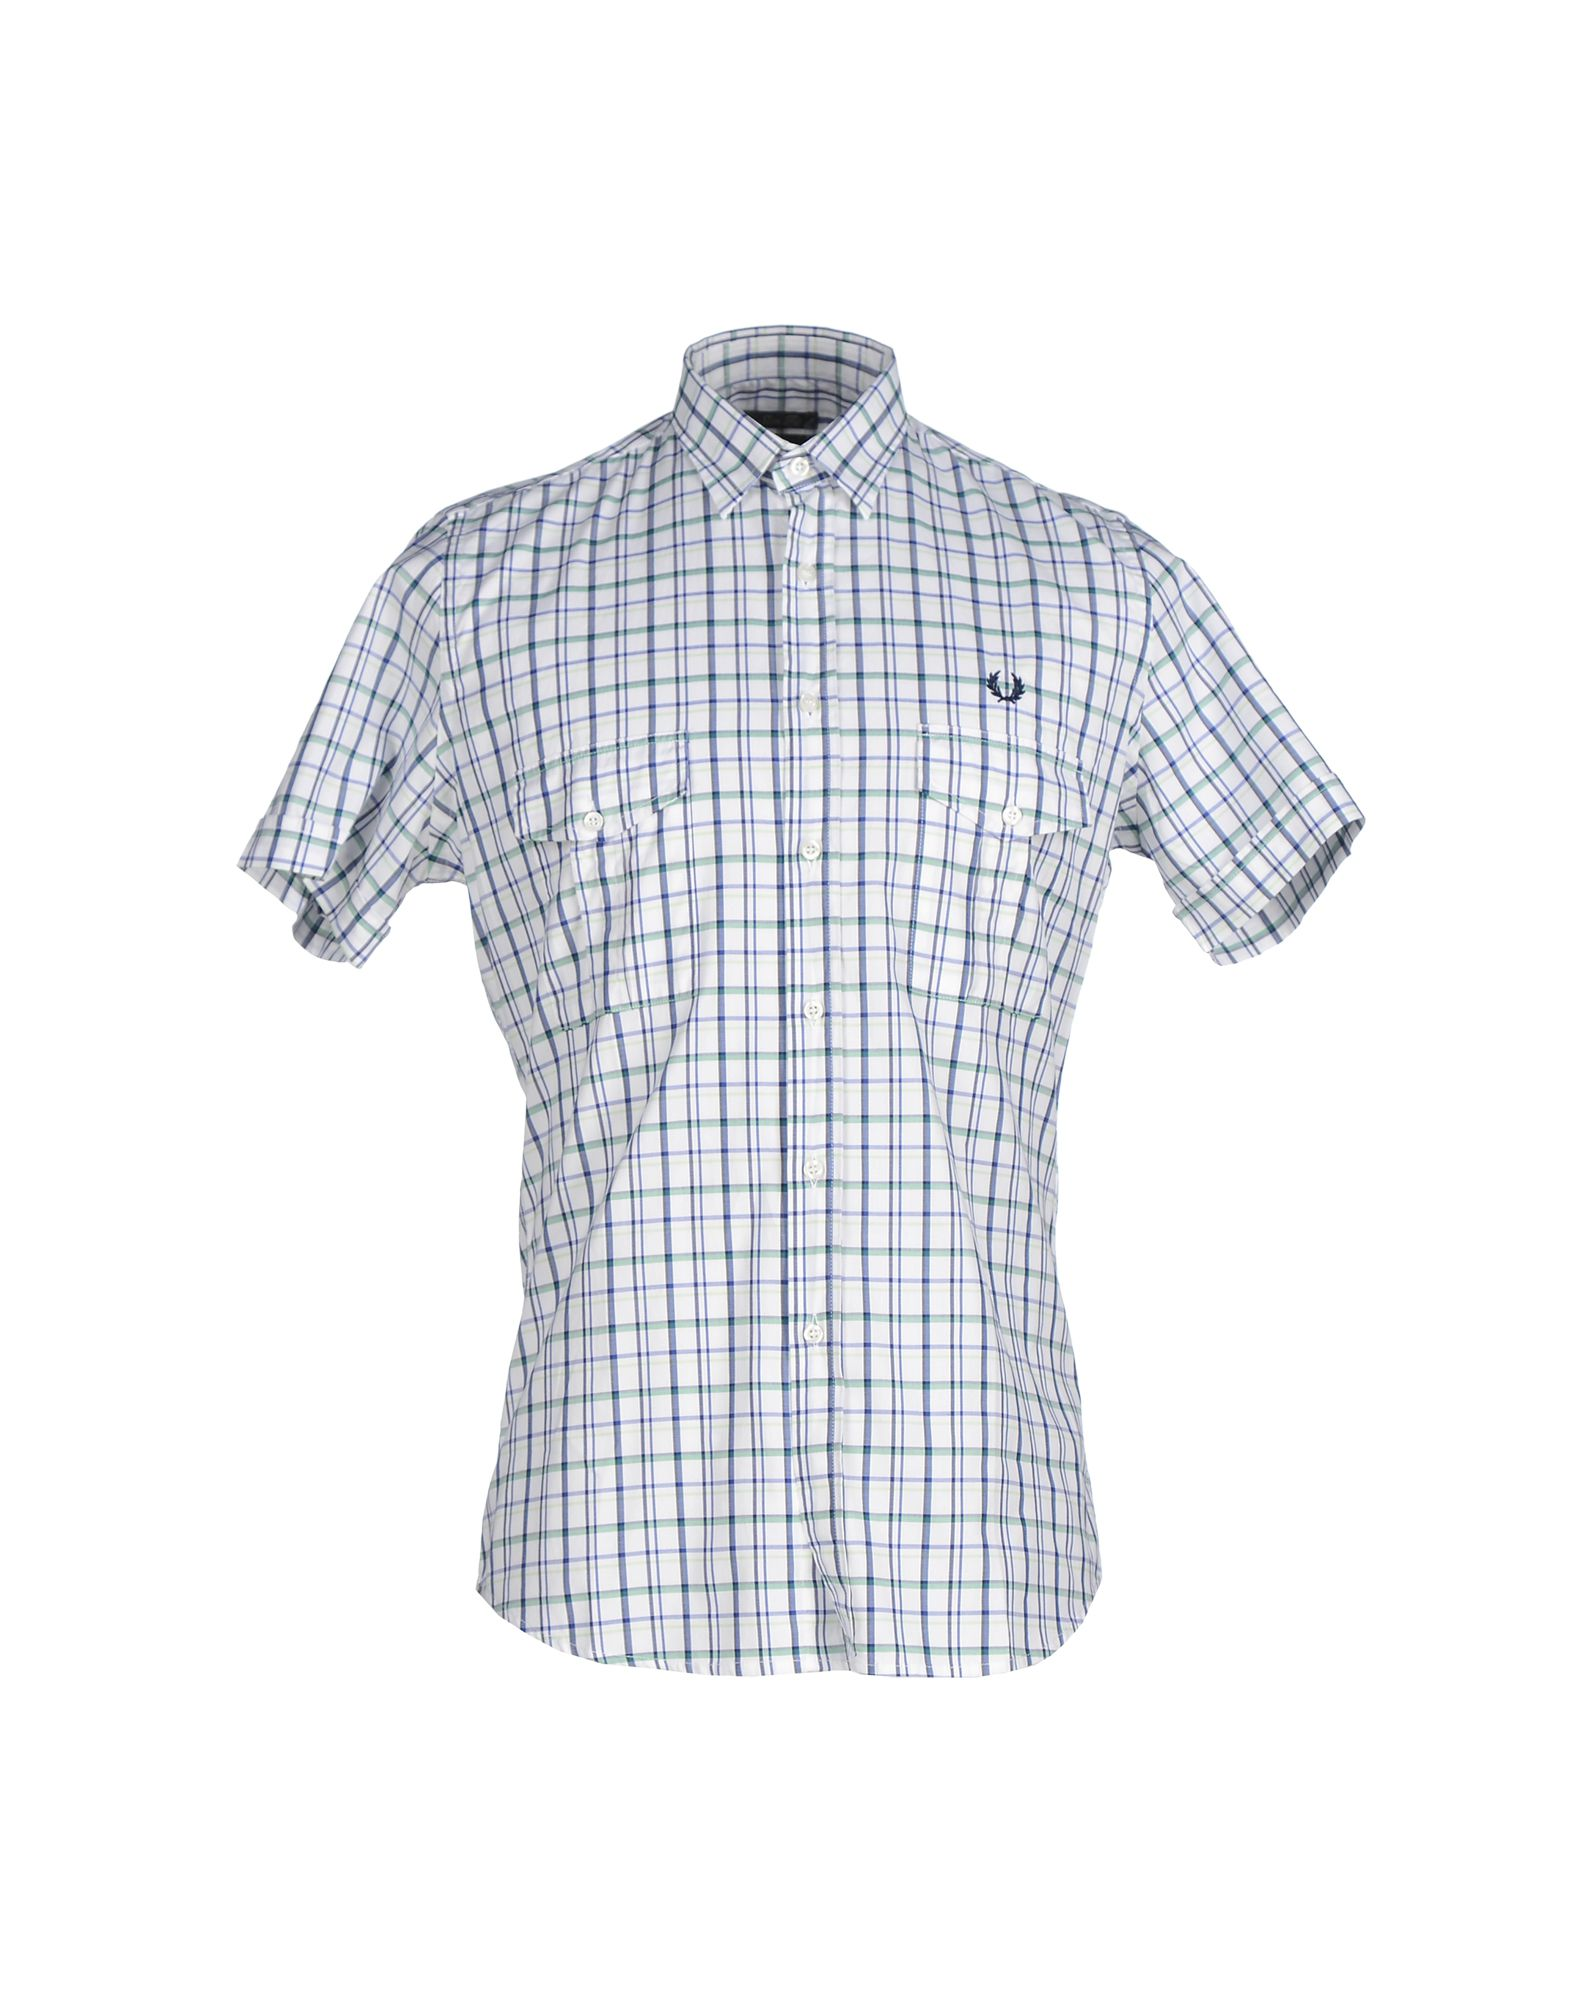 FRED PERRY メンズ シャツ ホワイト L コットン 100%